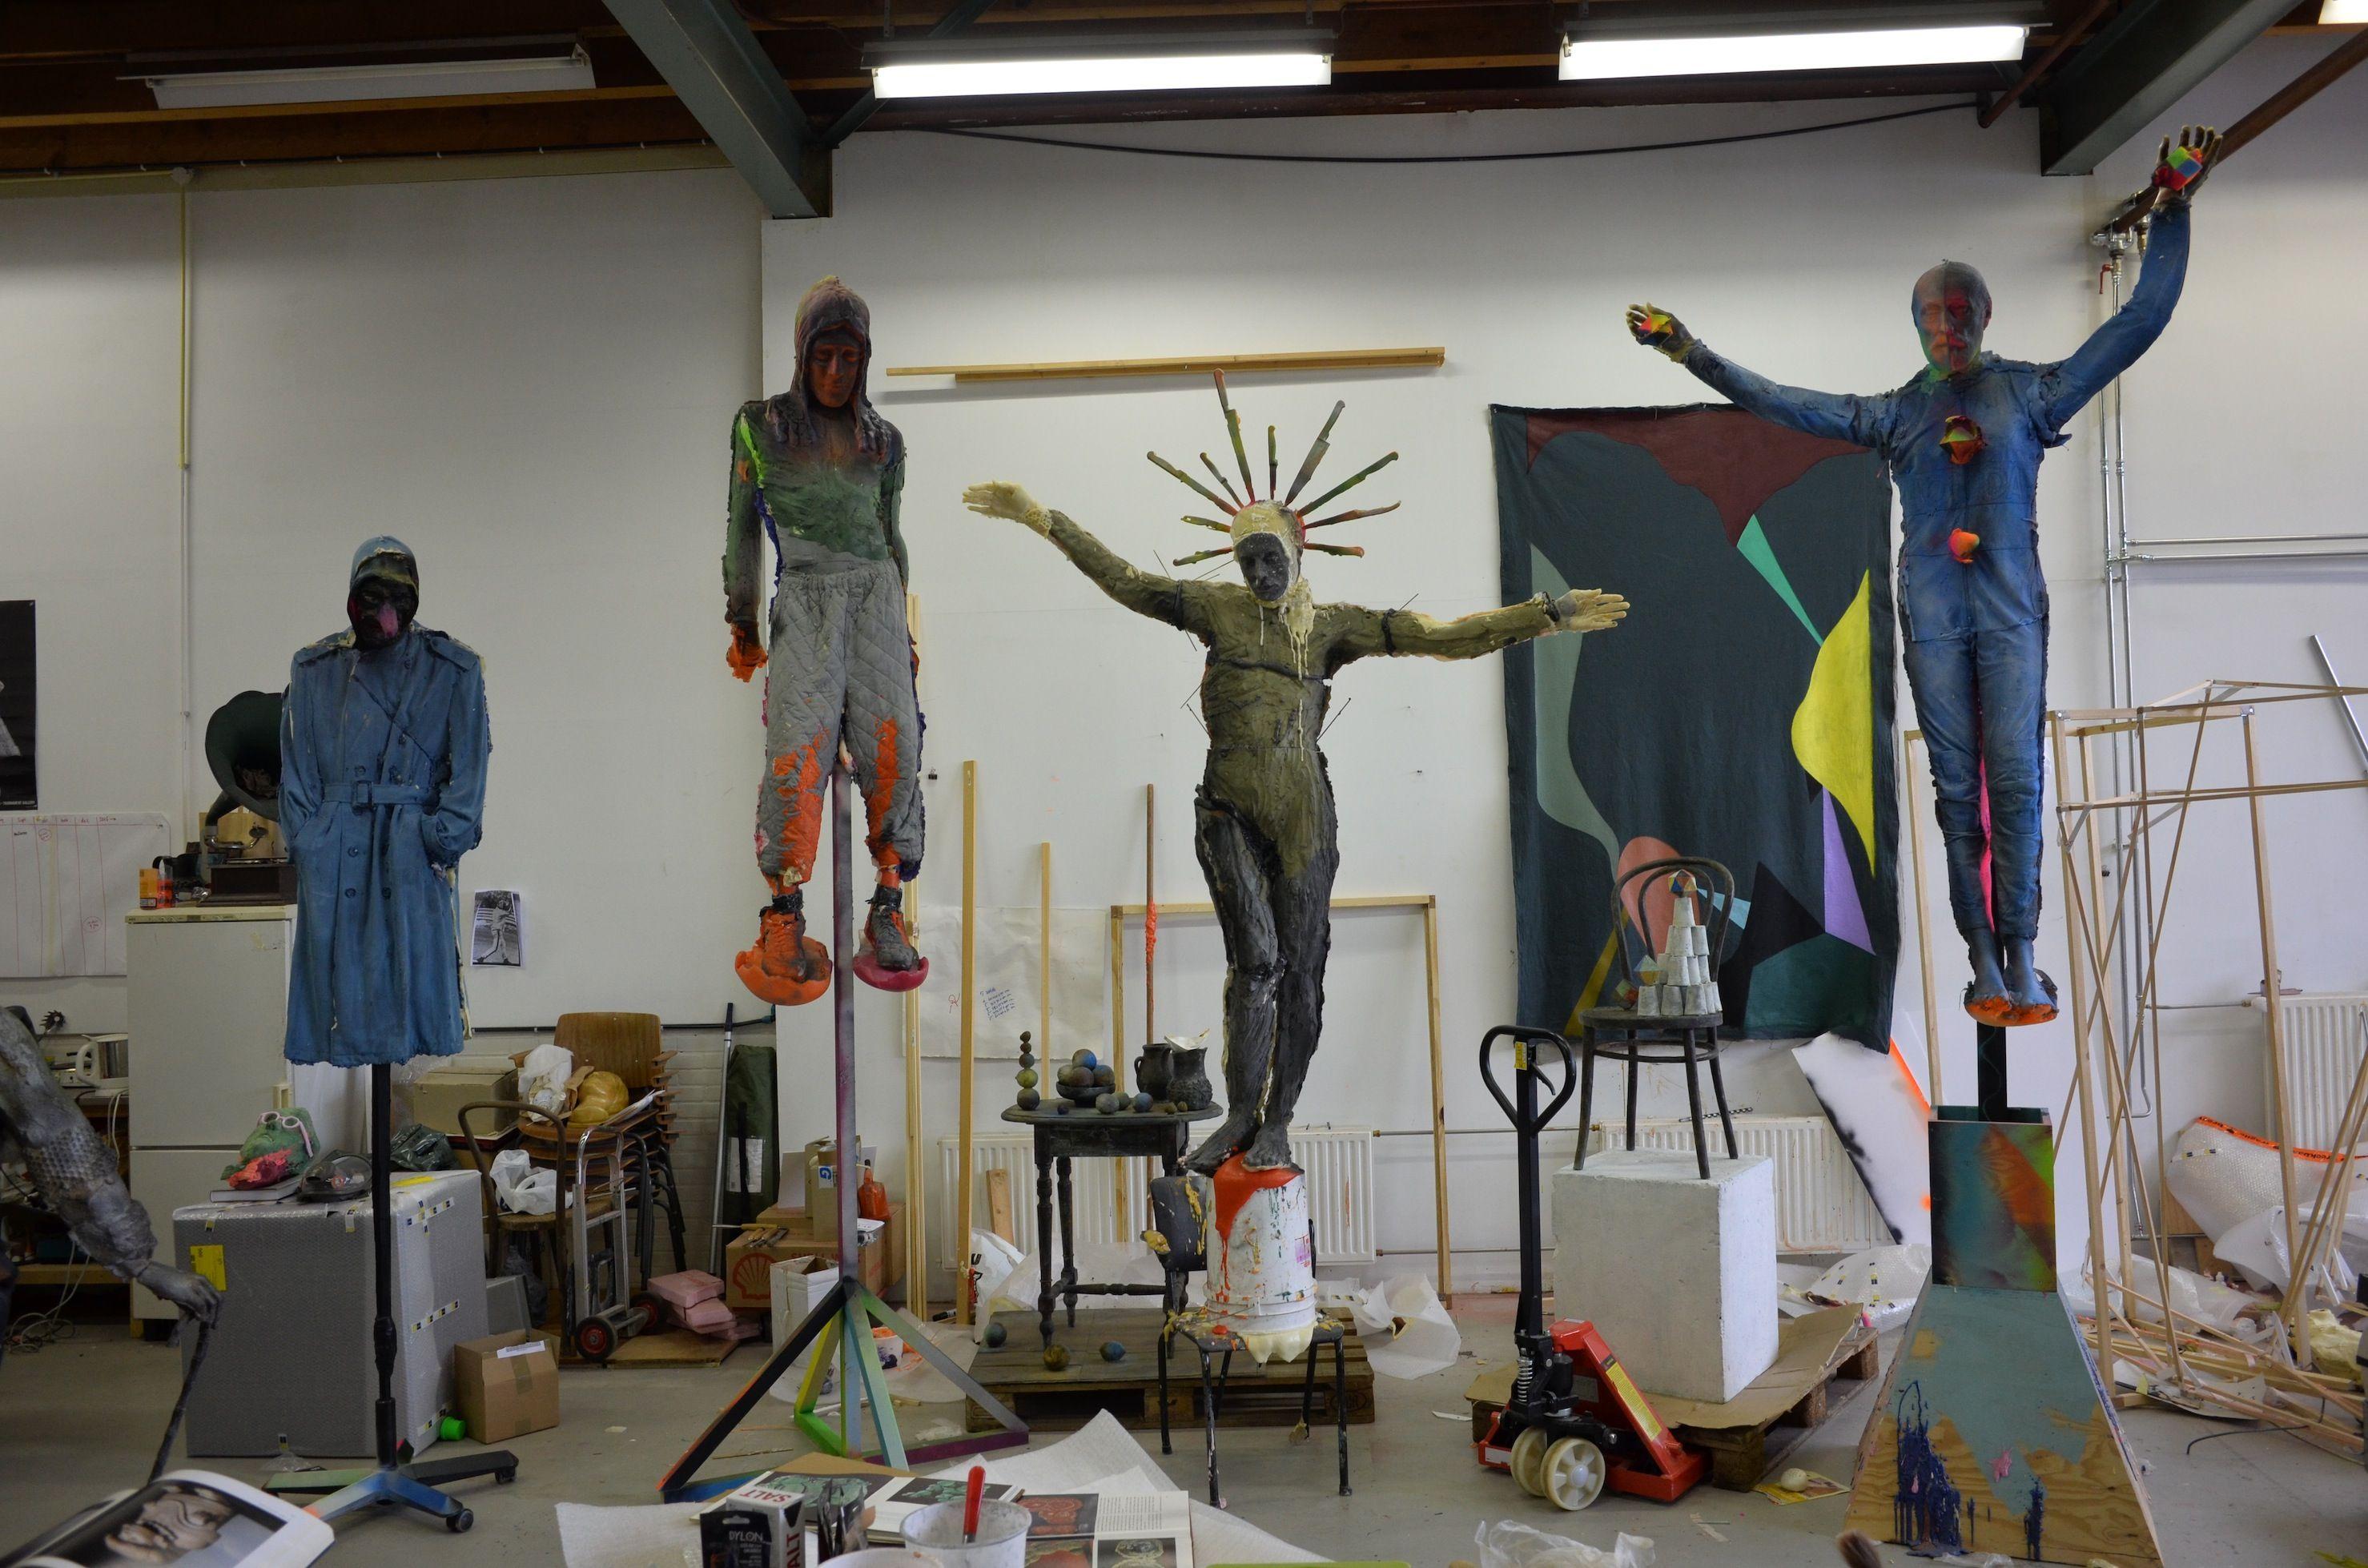 Folkert de Jong, Mobius Man, The Psalter man, Universal Man, 5 Star 40-40, 2014, Courtesy Galerie Dukan